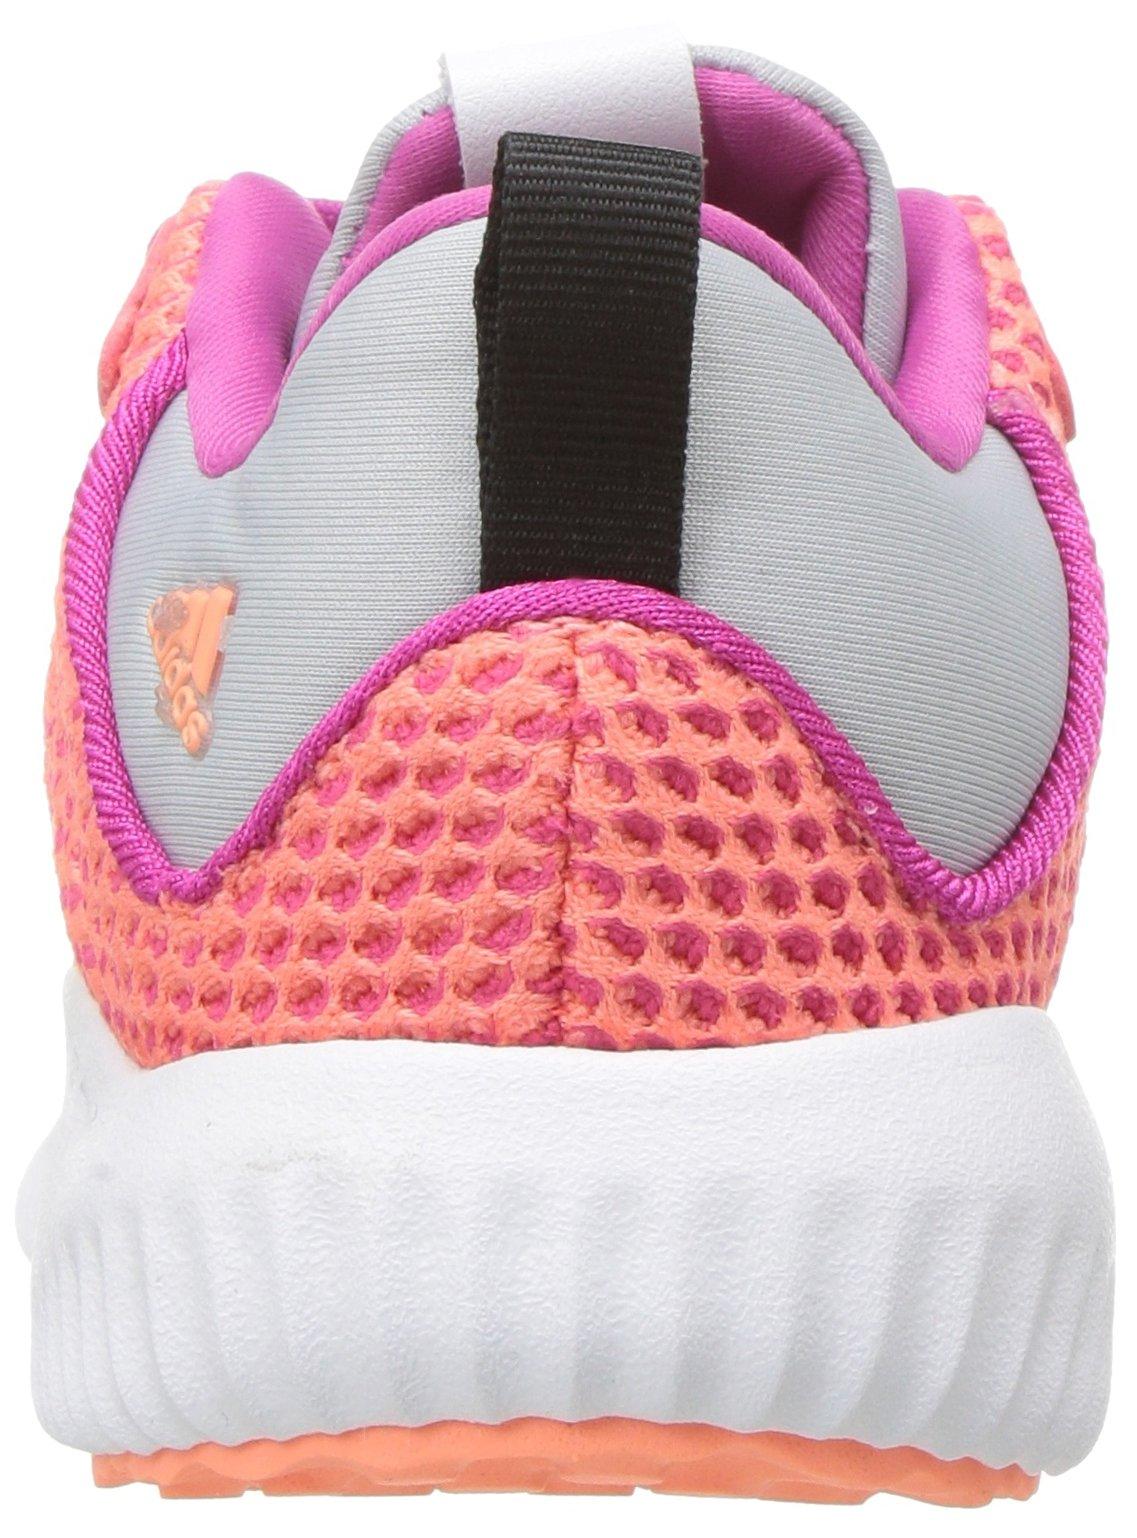 adidas Kids' Alphabounce Running Shoe, Bahia Magenta/Sun Glow/Clear Grey, 4 Medium US Toddler by adidas (Image #2)